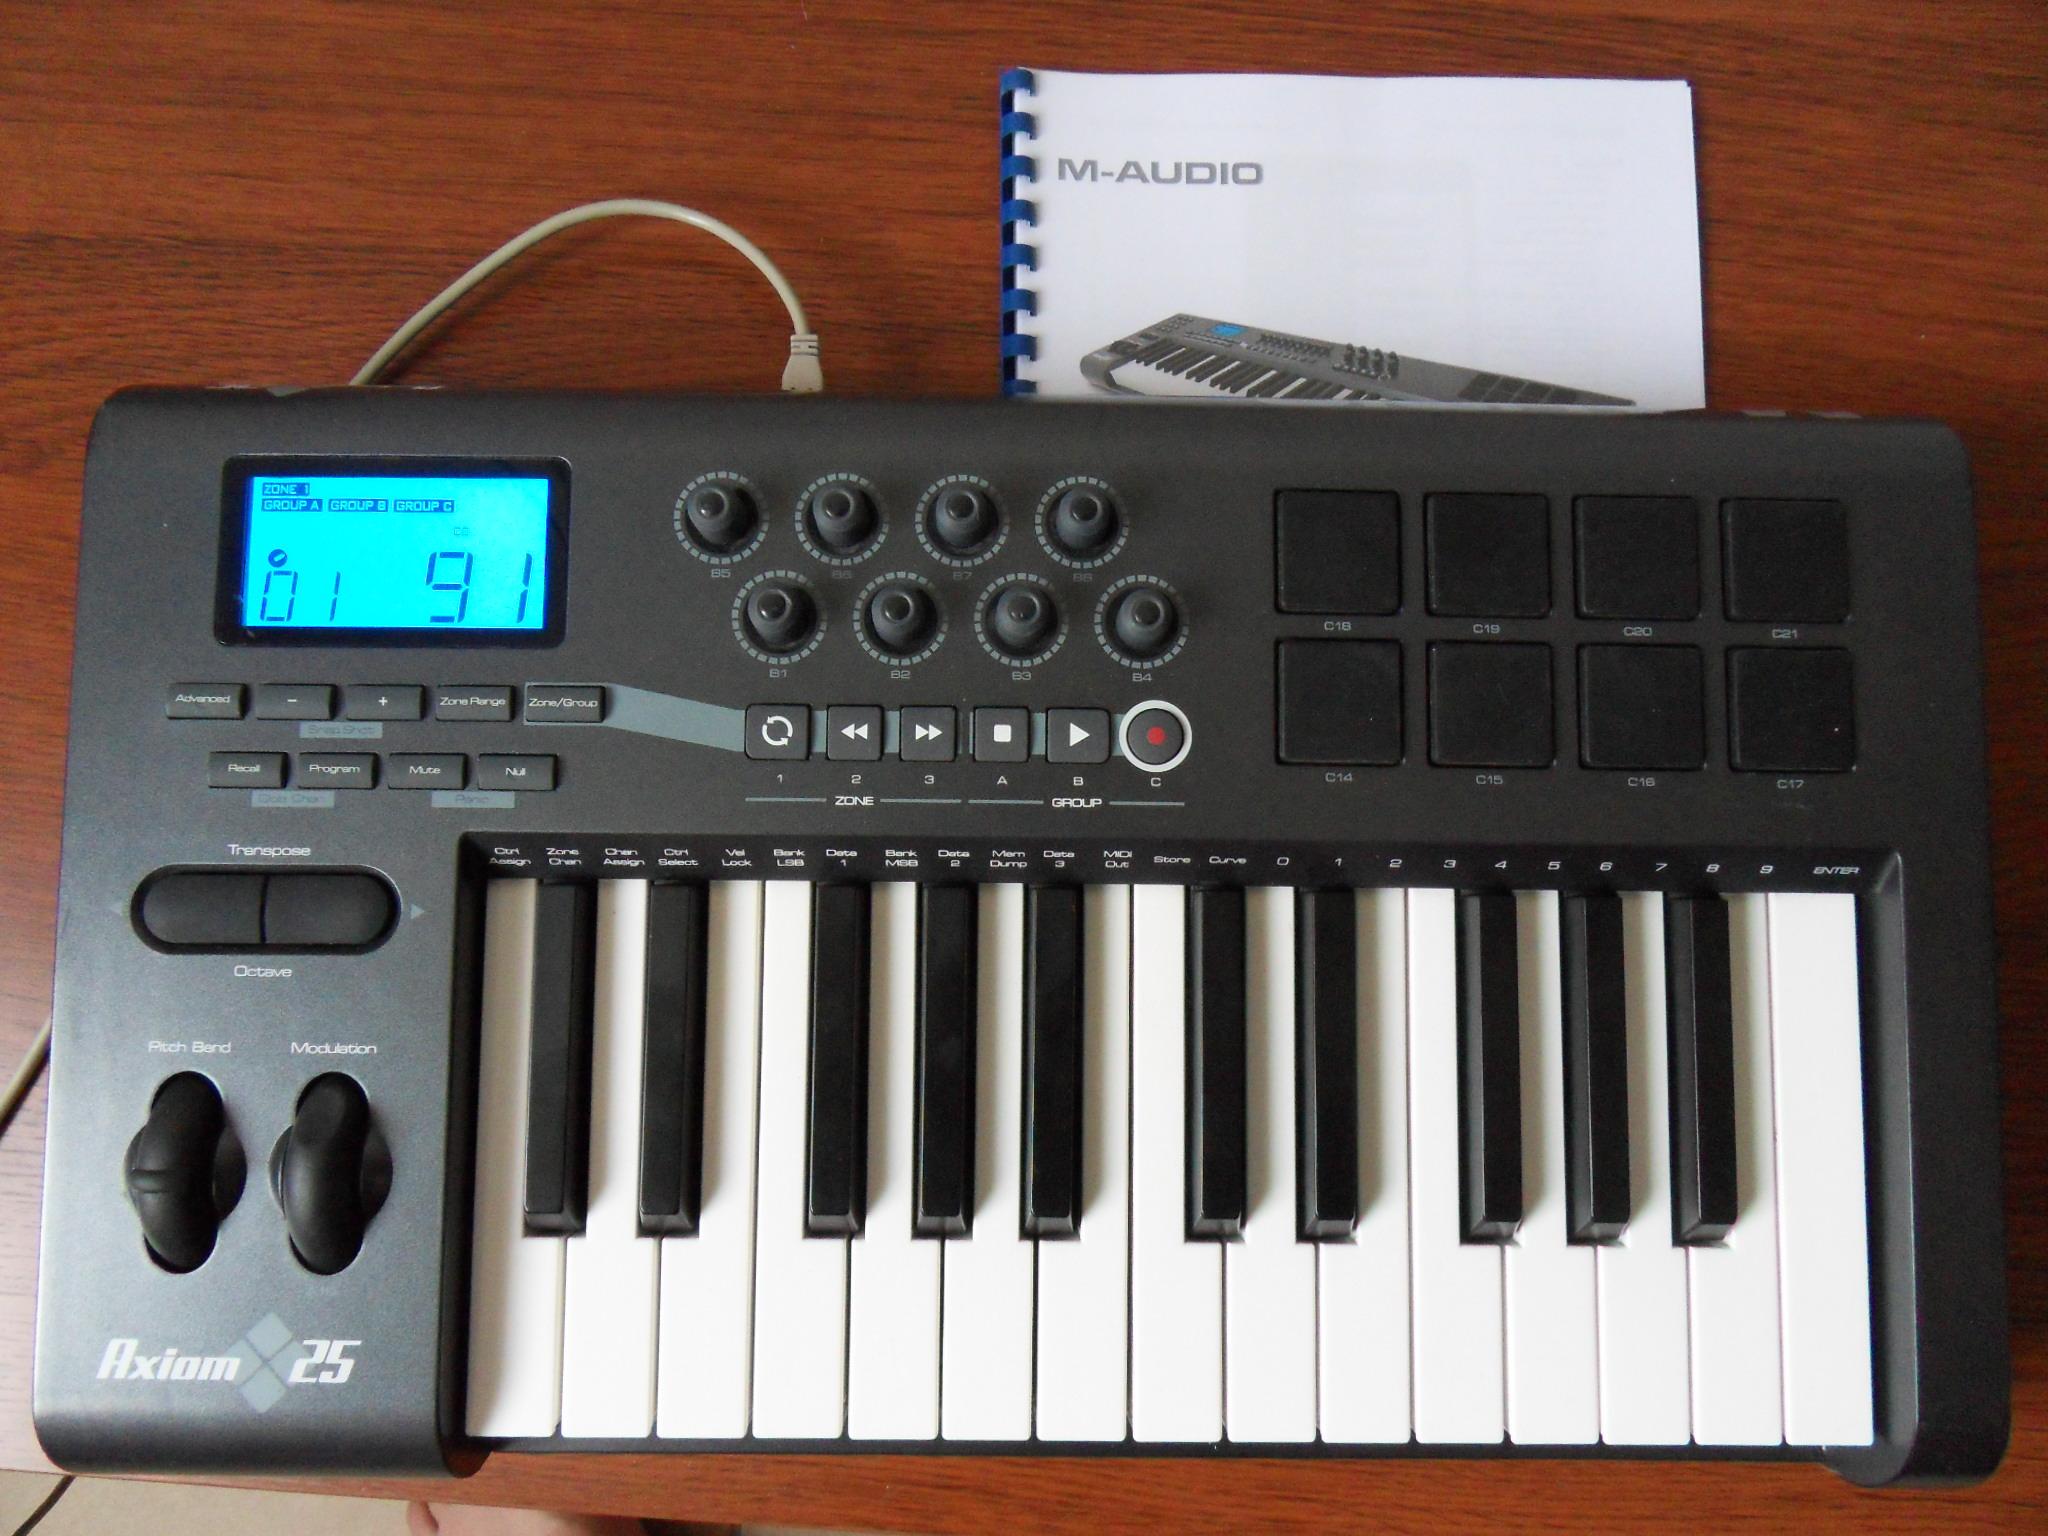 m audio axiom 25 image 372756 audiofanzine rh en audiofanzine com m audio axiom 25 manual pdf m-audio axiom 25 manual español